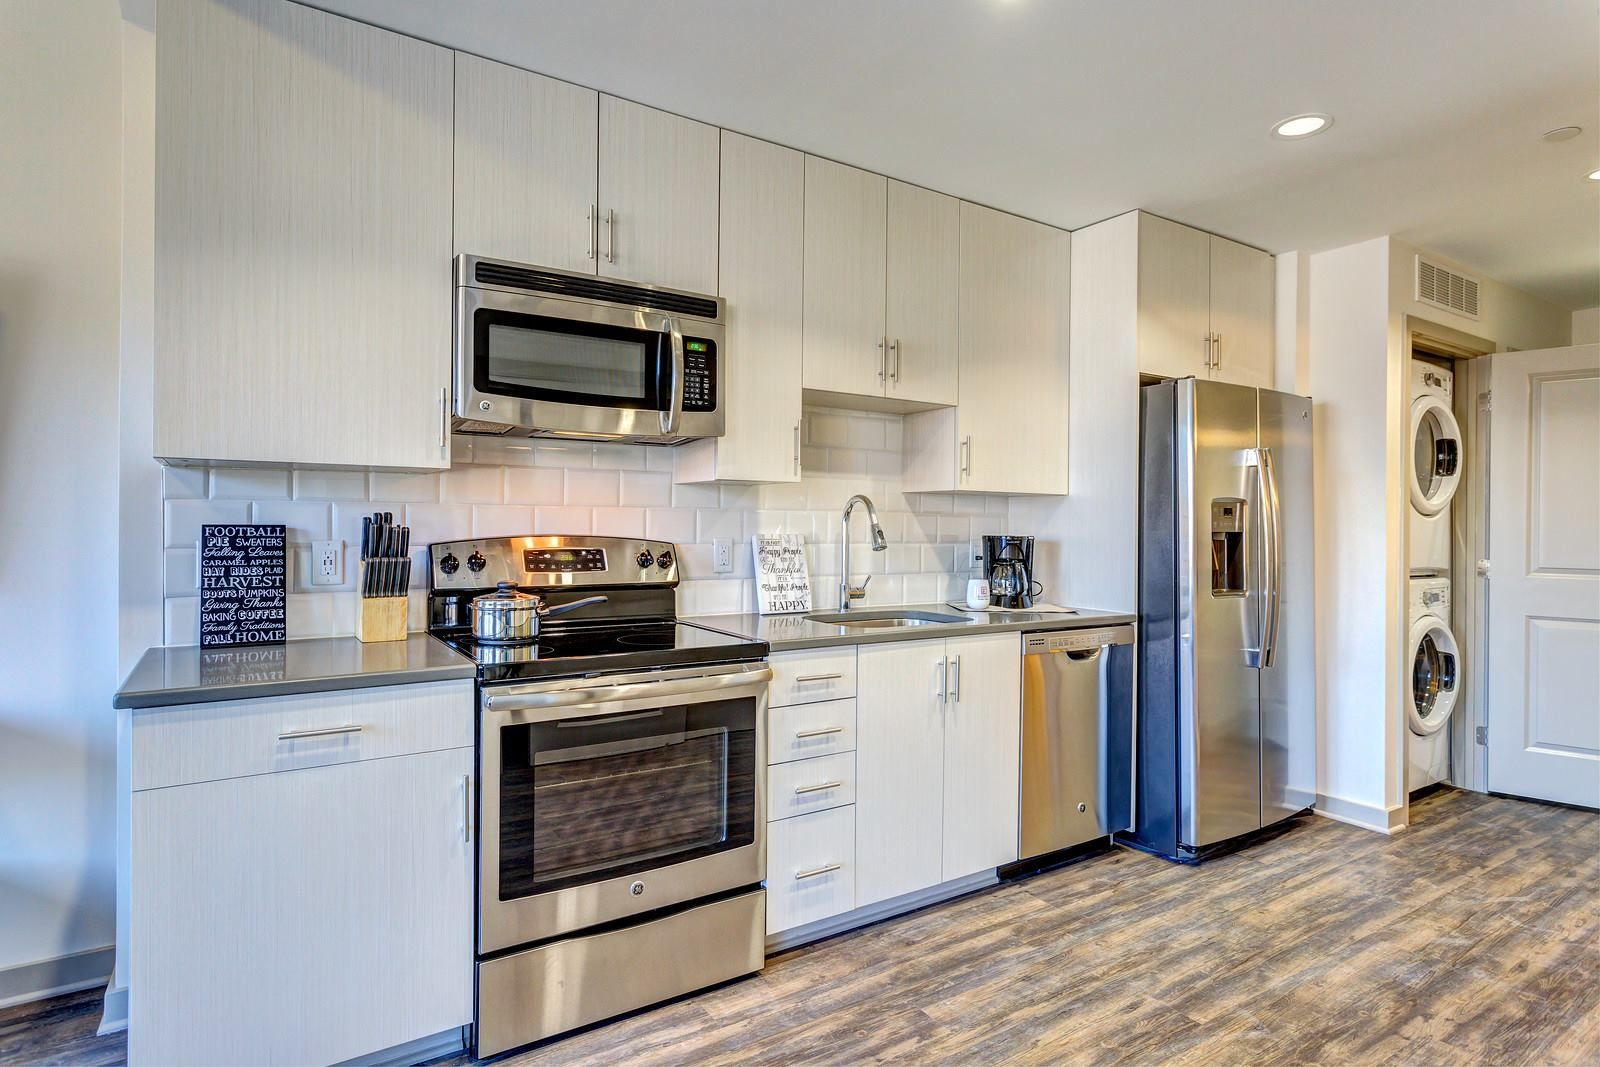 Luxurious studio apartment home in Nashville, TN